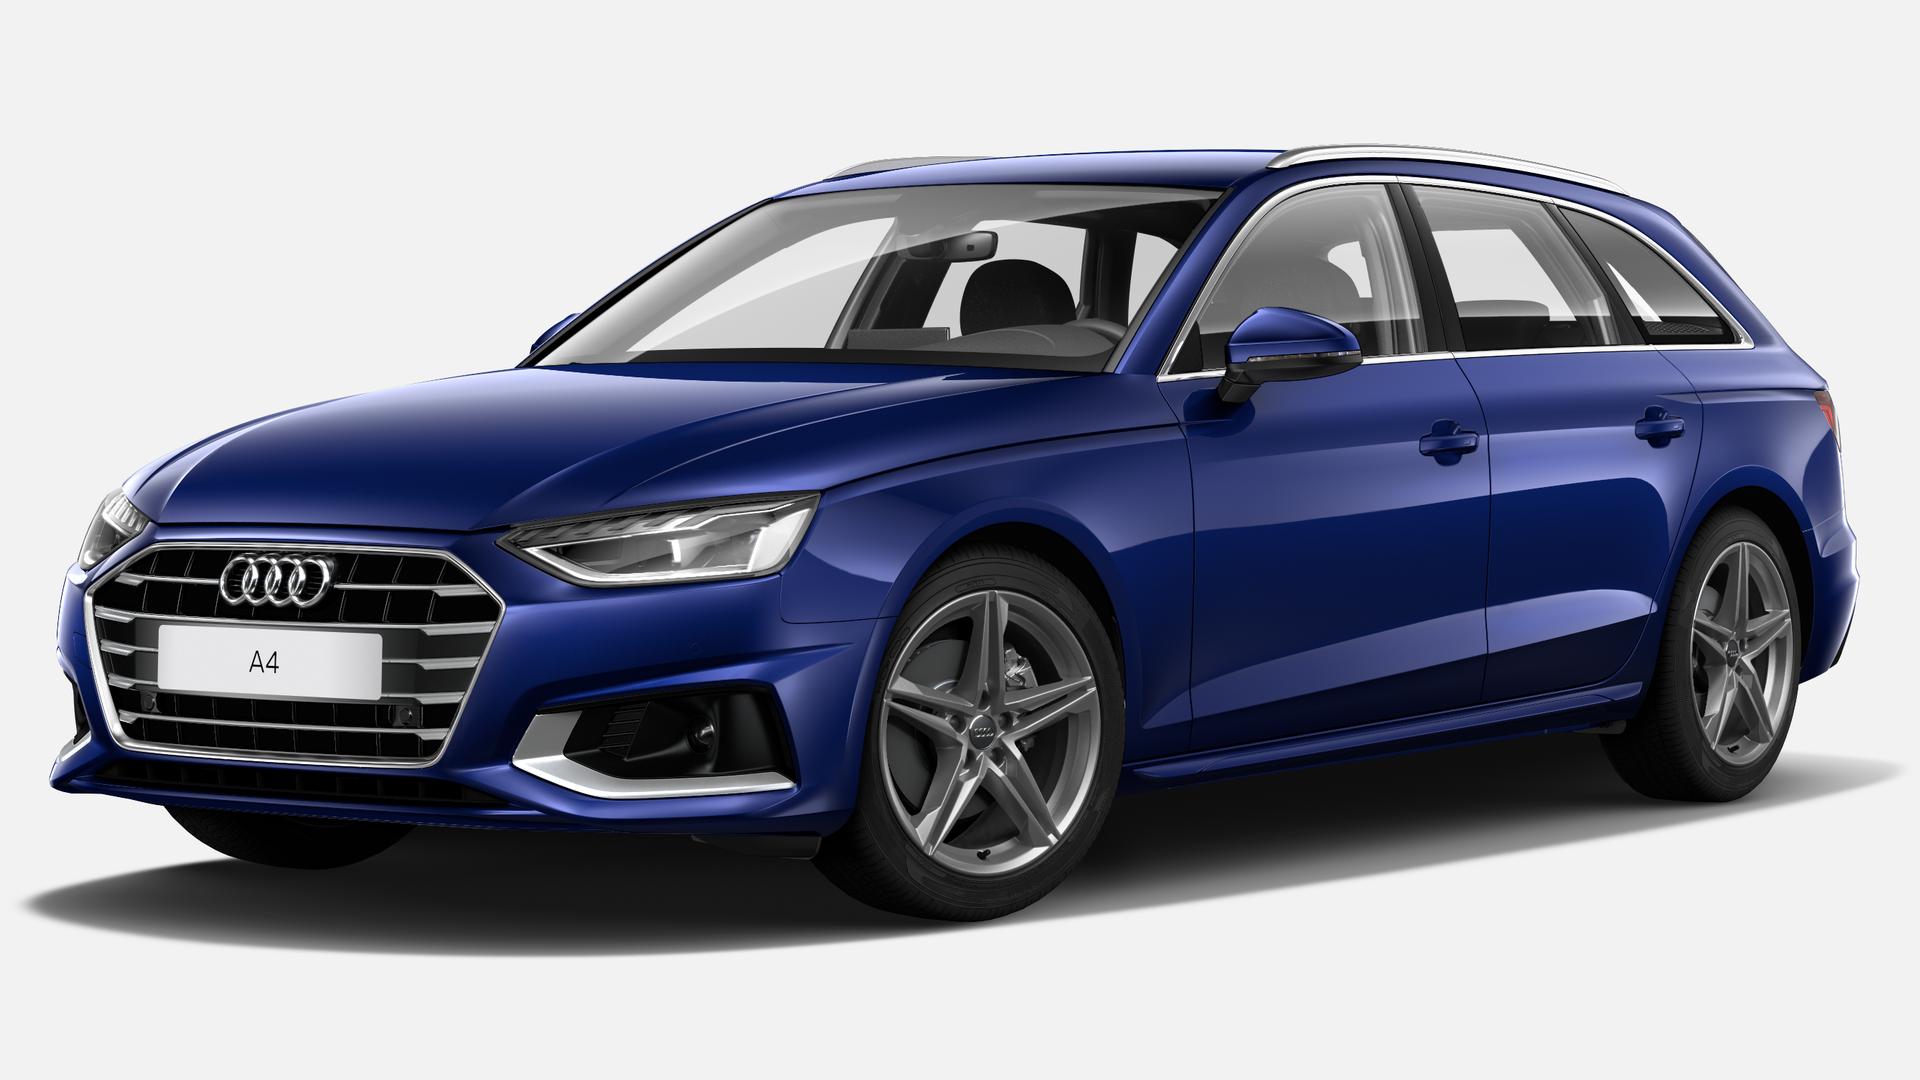 Foto 1 Audi A4 Avant 35 TFSI Advanced S tronic 110 kW (150 CV)